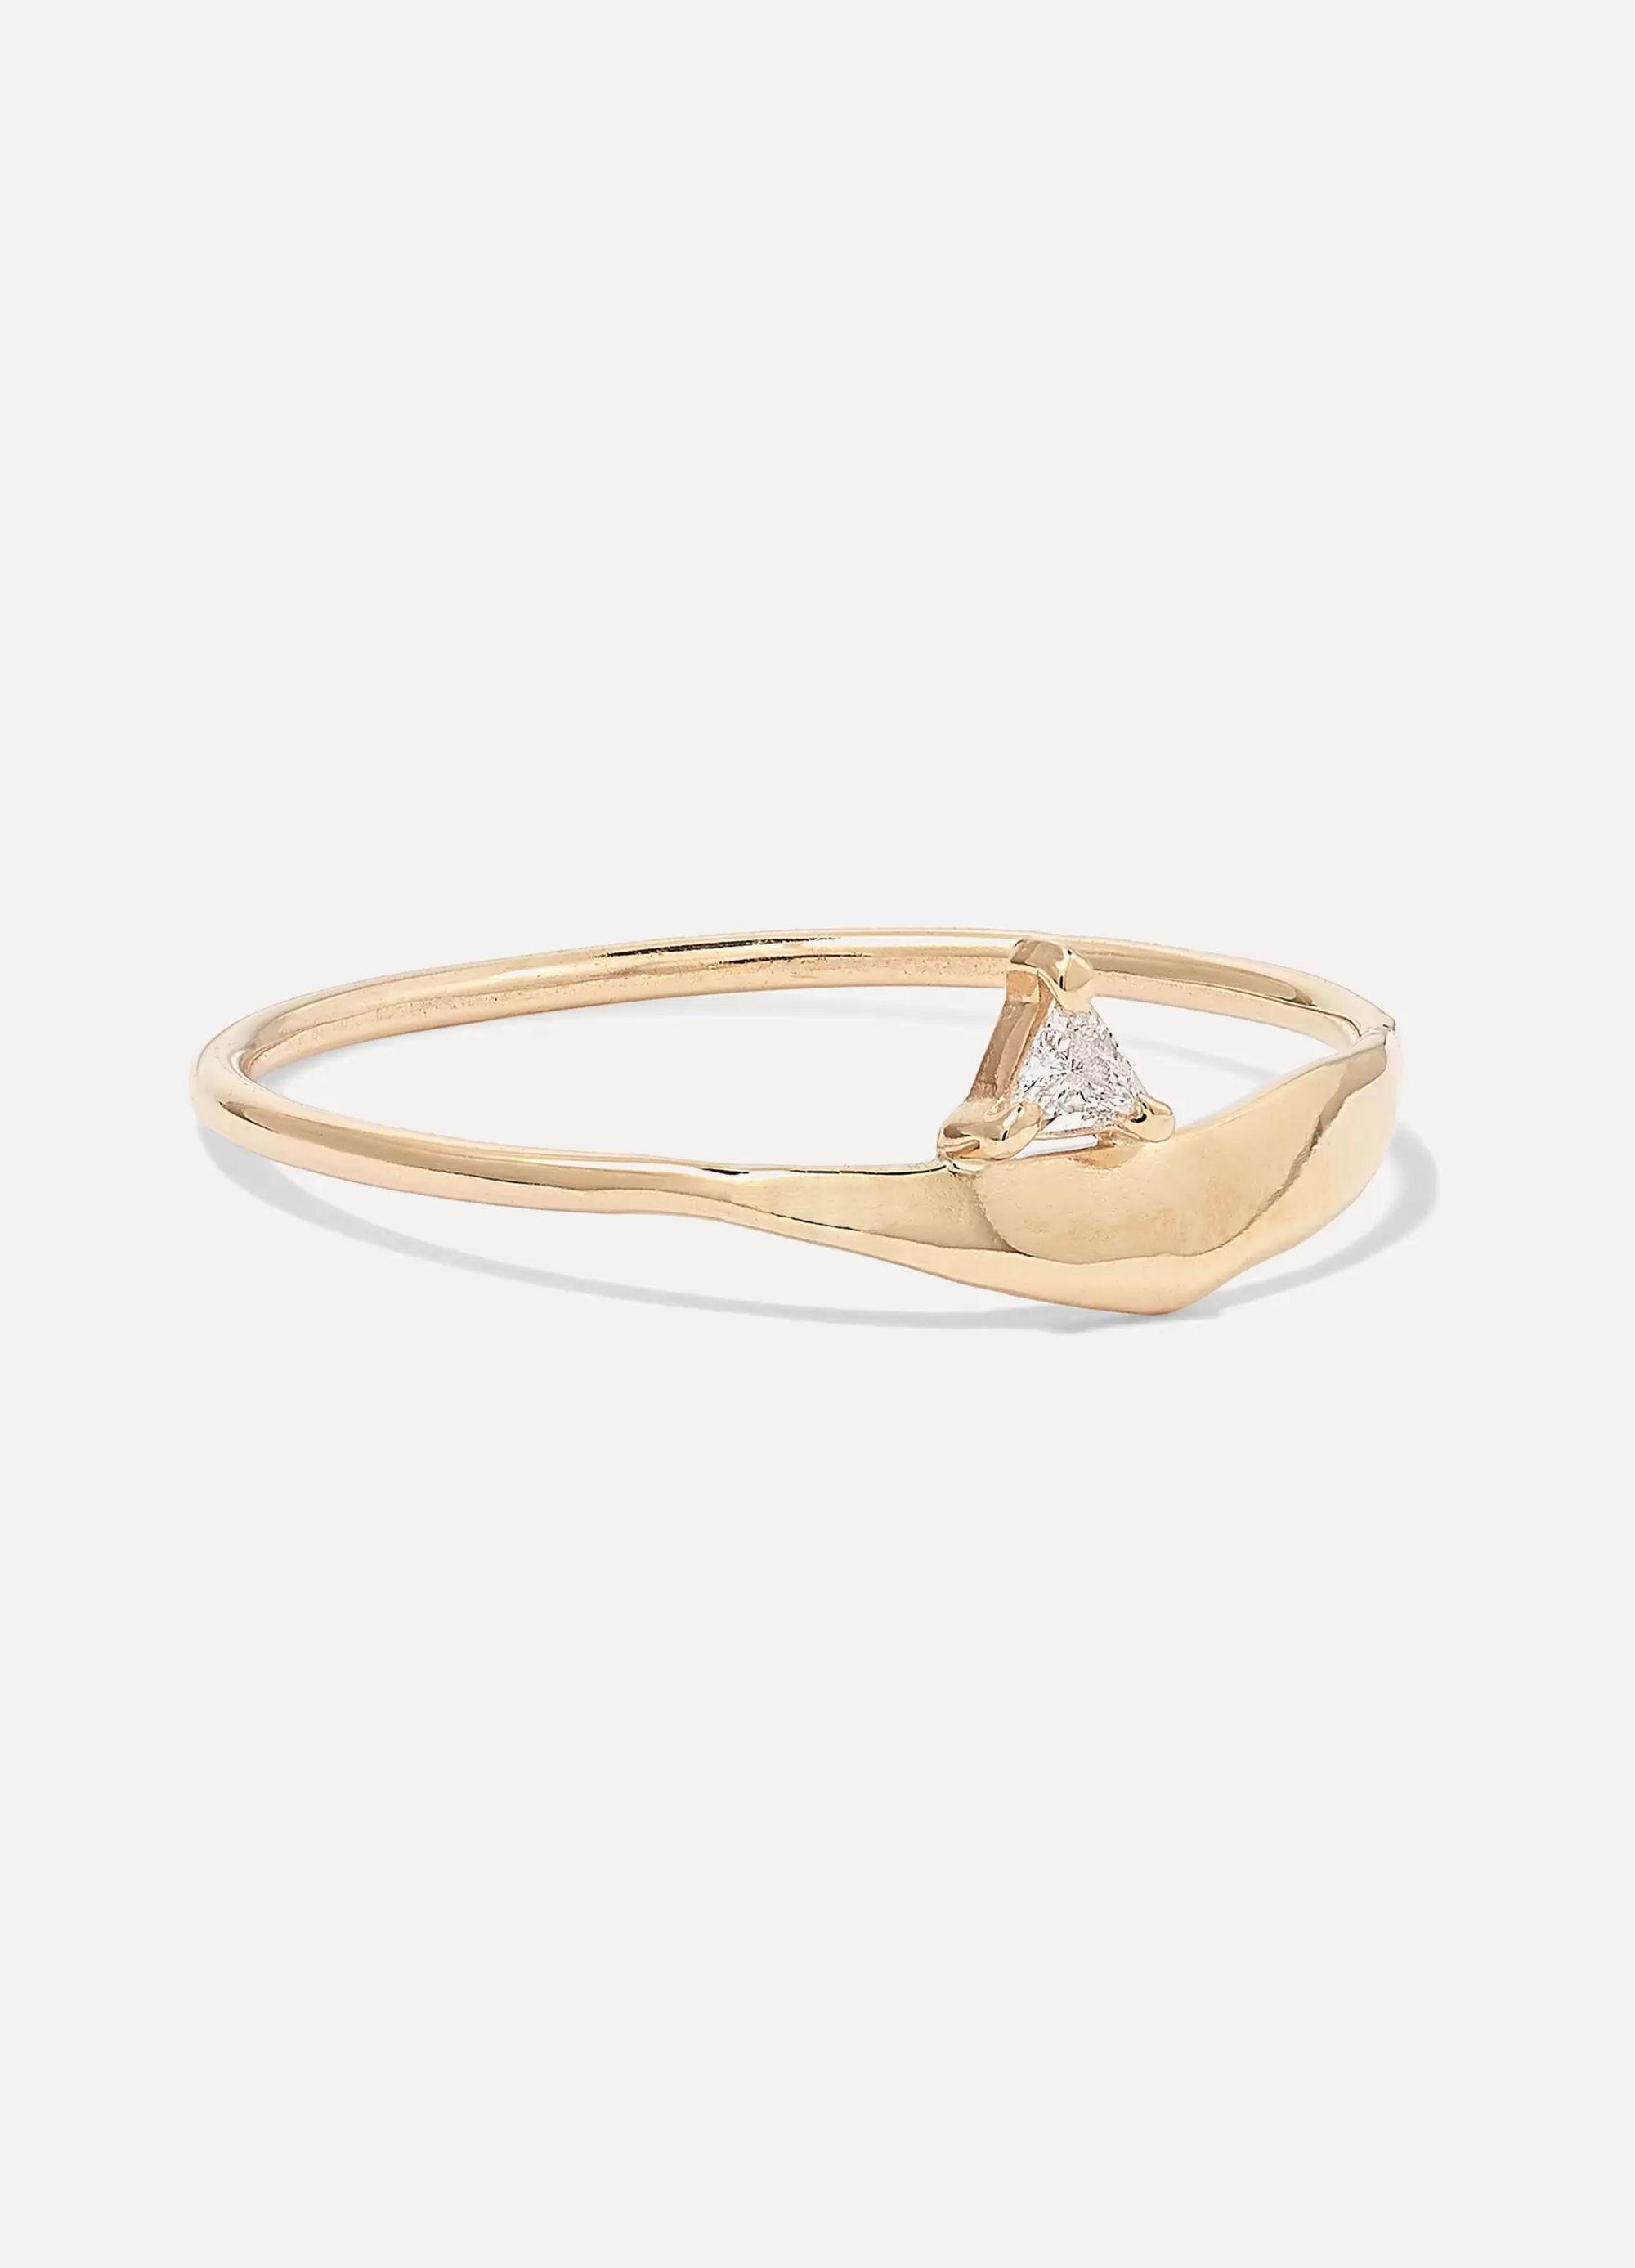 SARAH & SEBASTIAN Fragment gold diamond ring